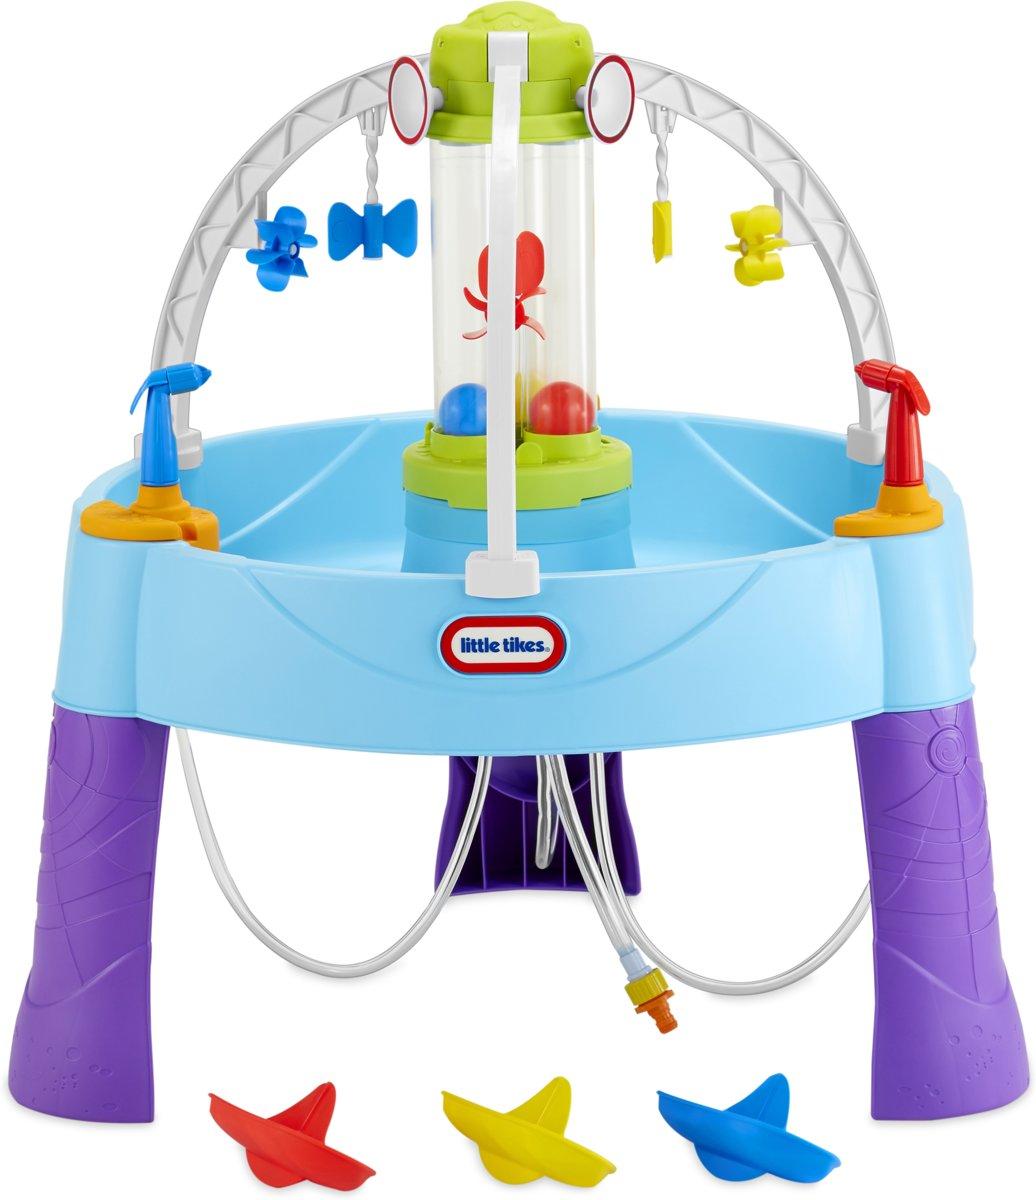 Little Tikes Fun Zone Battle Splash - Watertafel